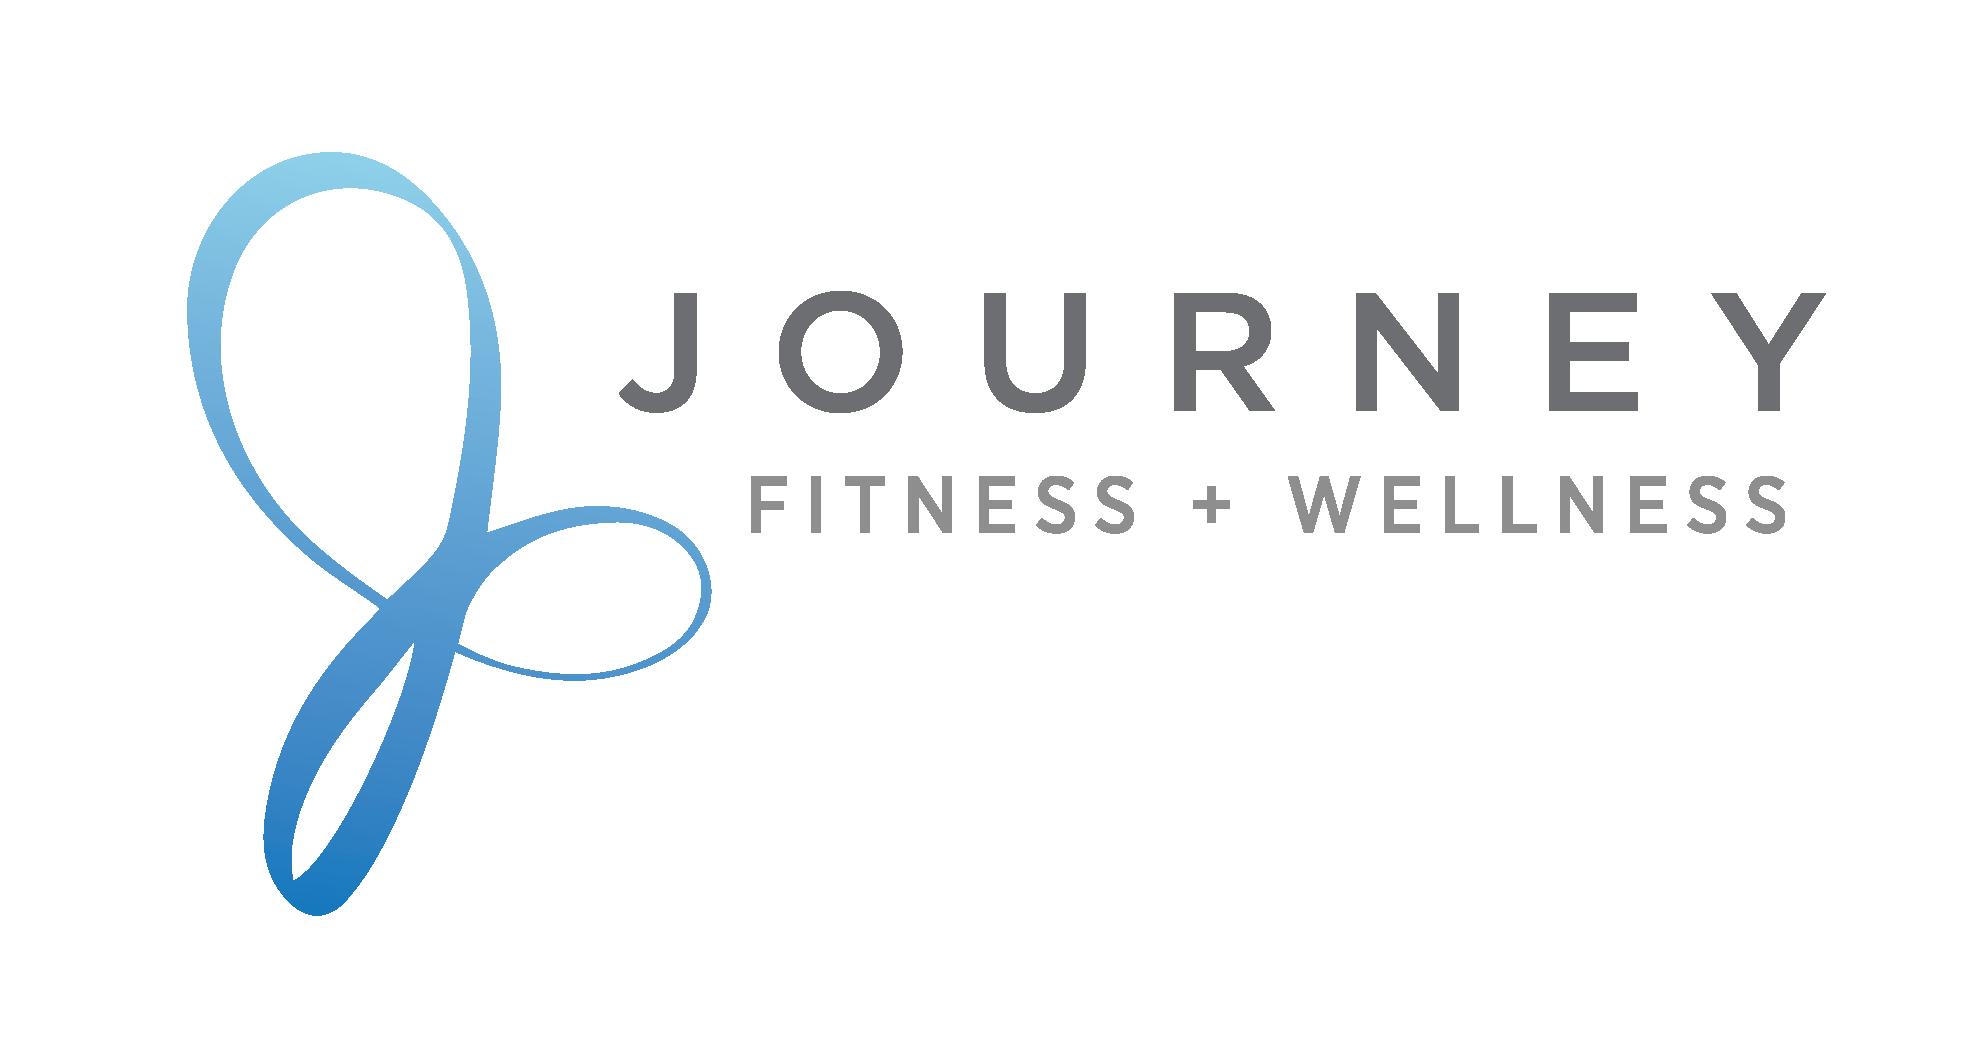 Journey Fitness + Wellness